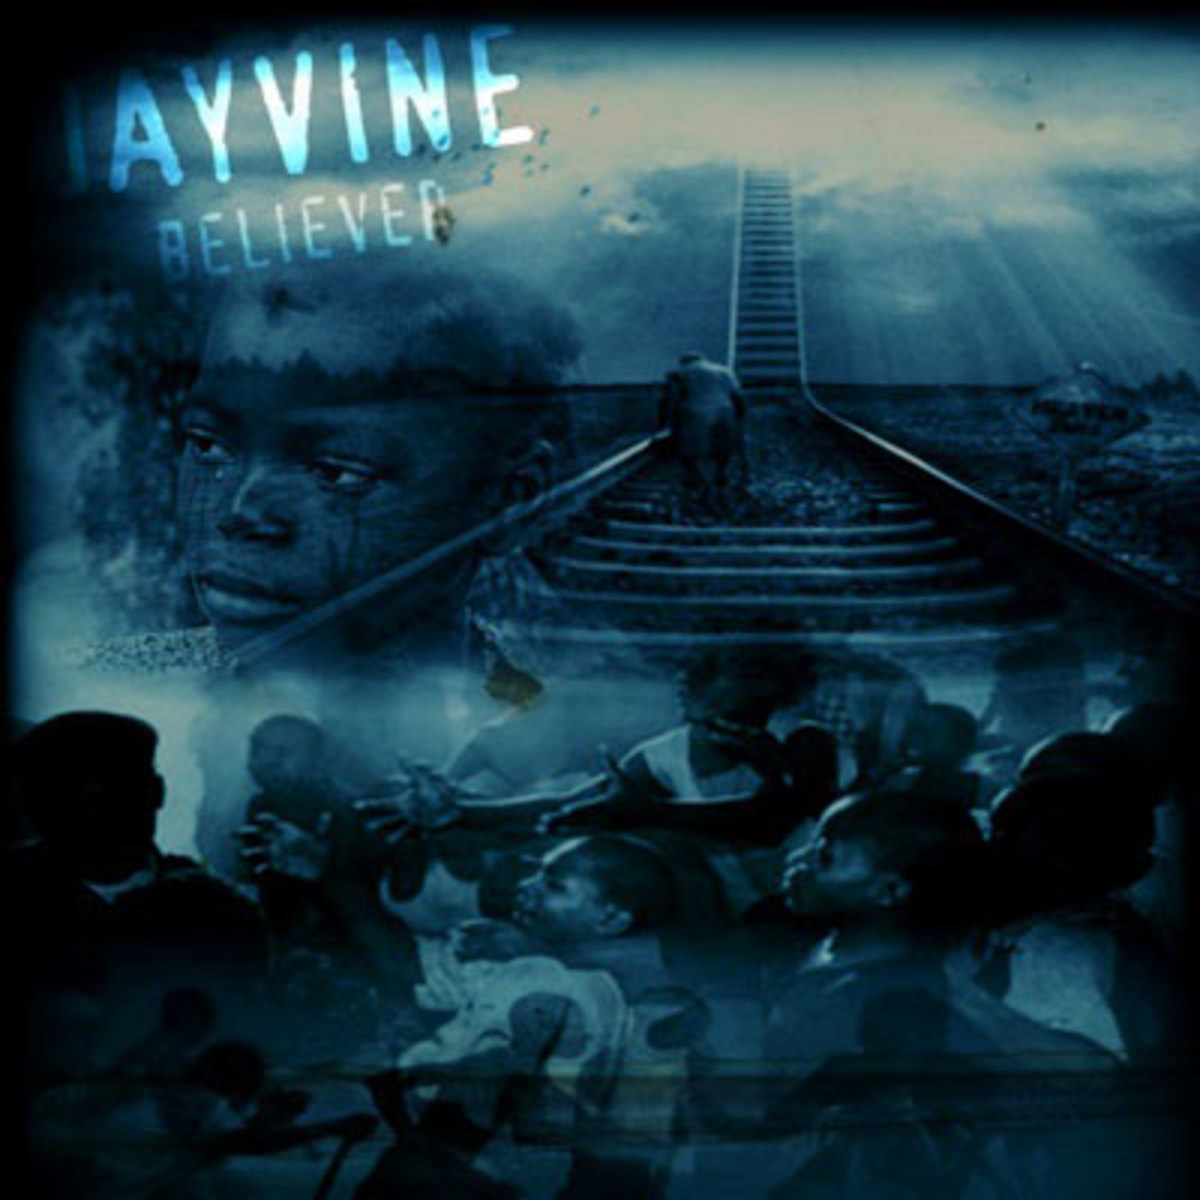 jayvine-thebeliever.jpg